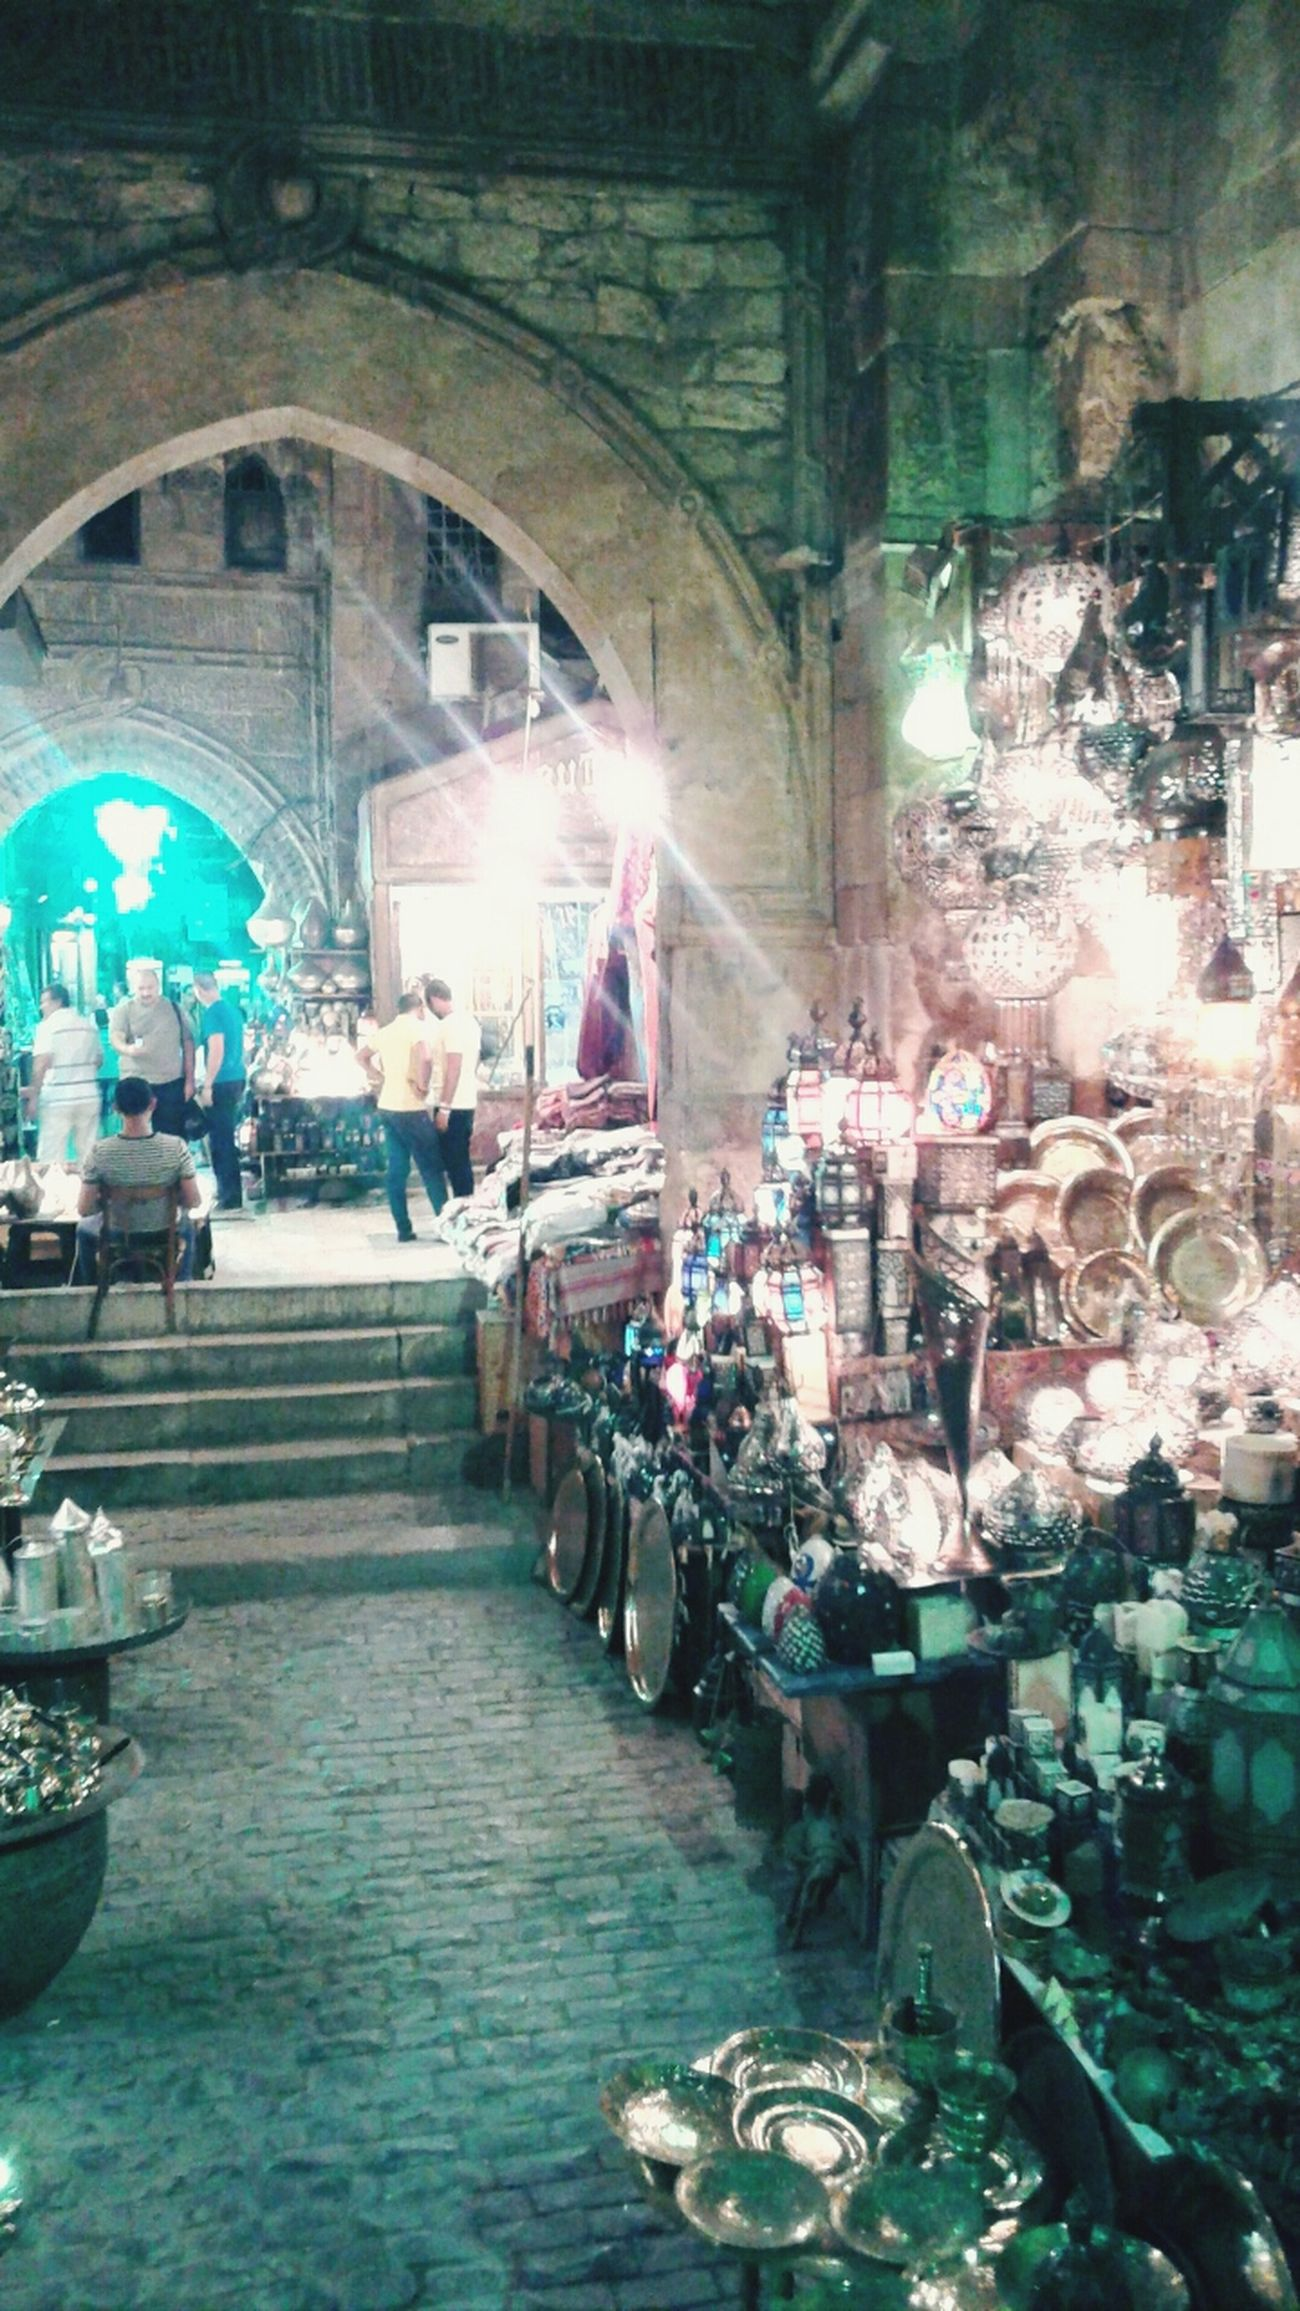 Suq 'arabiyy Treasure Hunting Shopping Great Deals